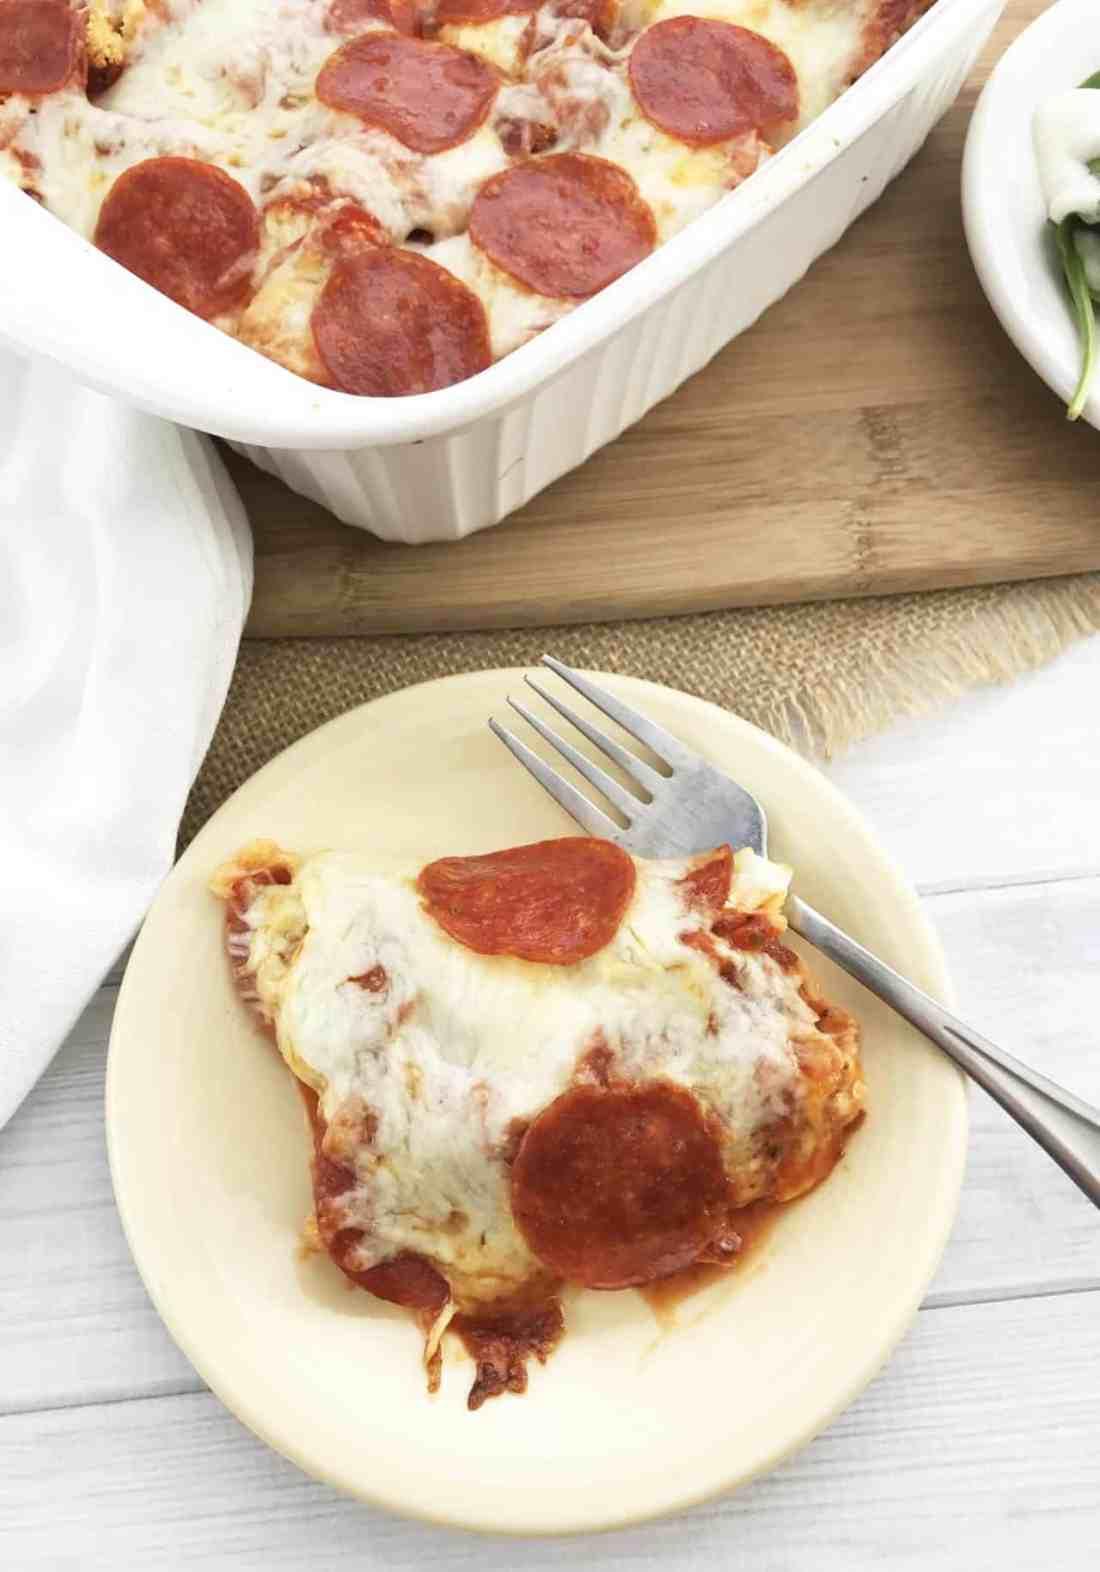 deconstructed pizza casserole keto friendly